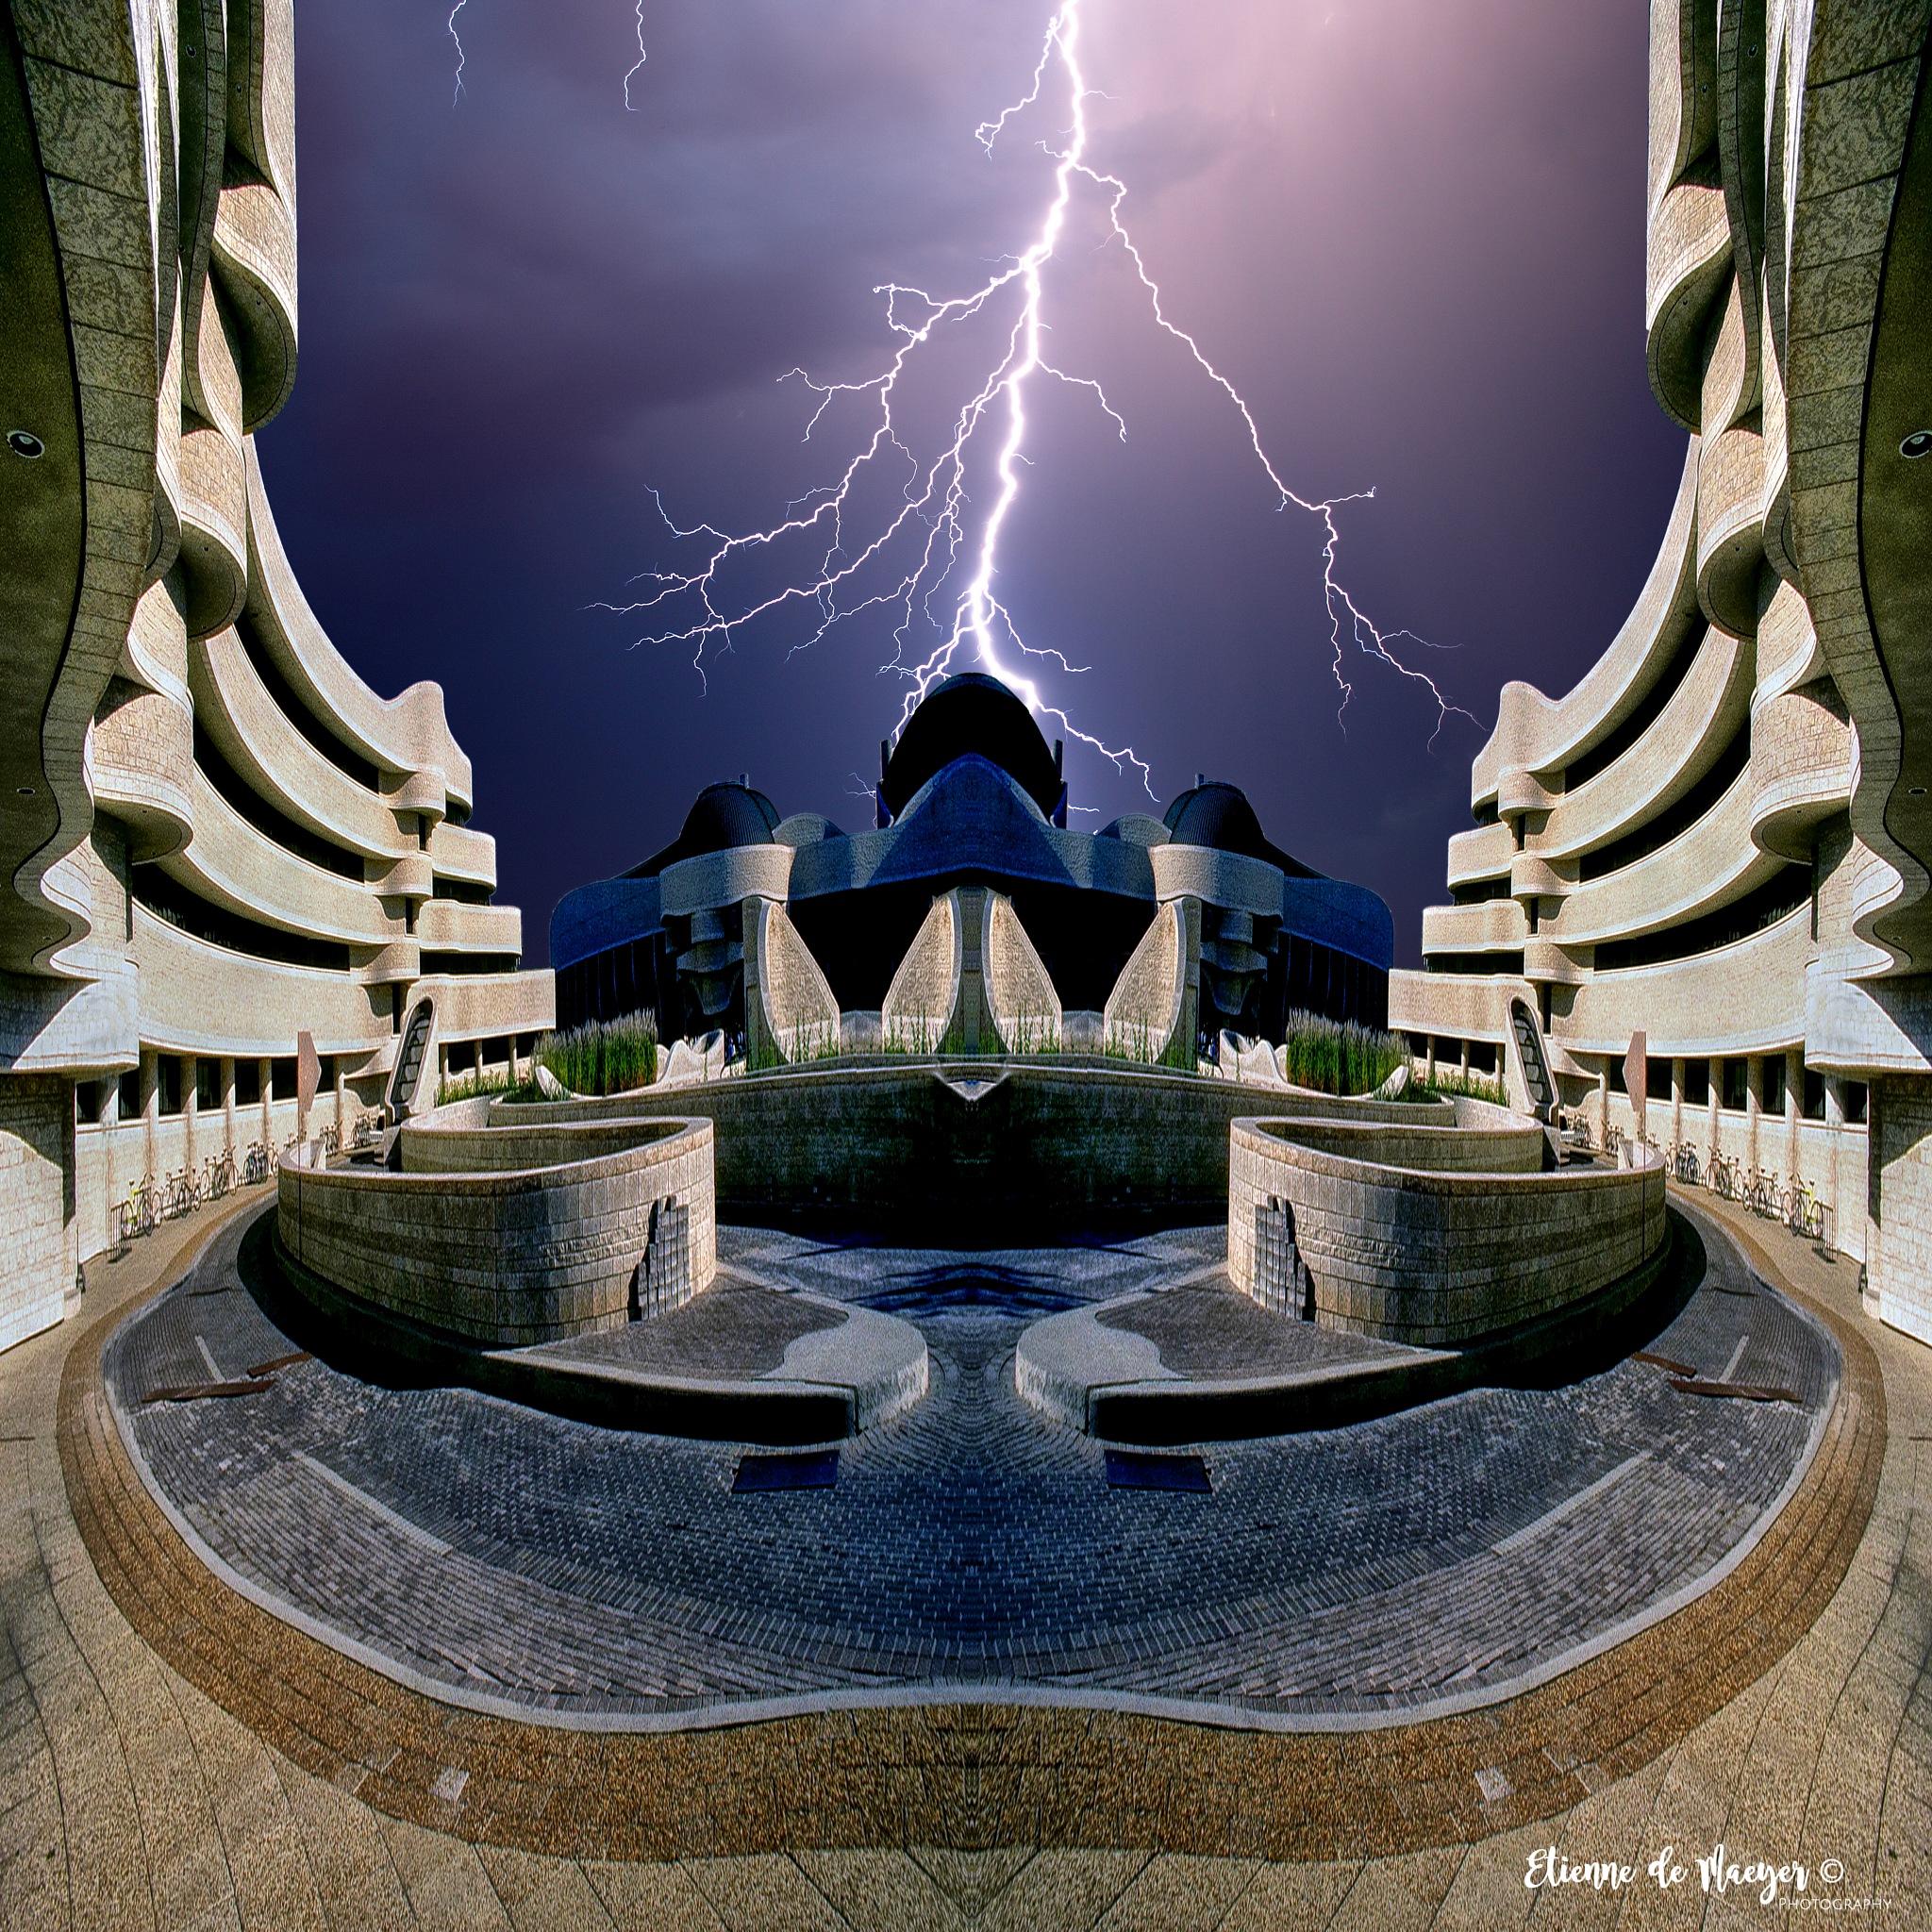 Fantasy by Etienne de Maeyer